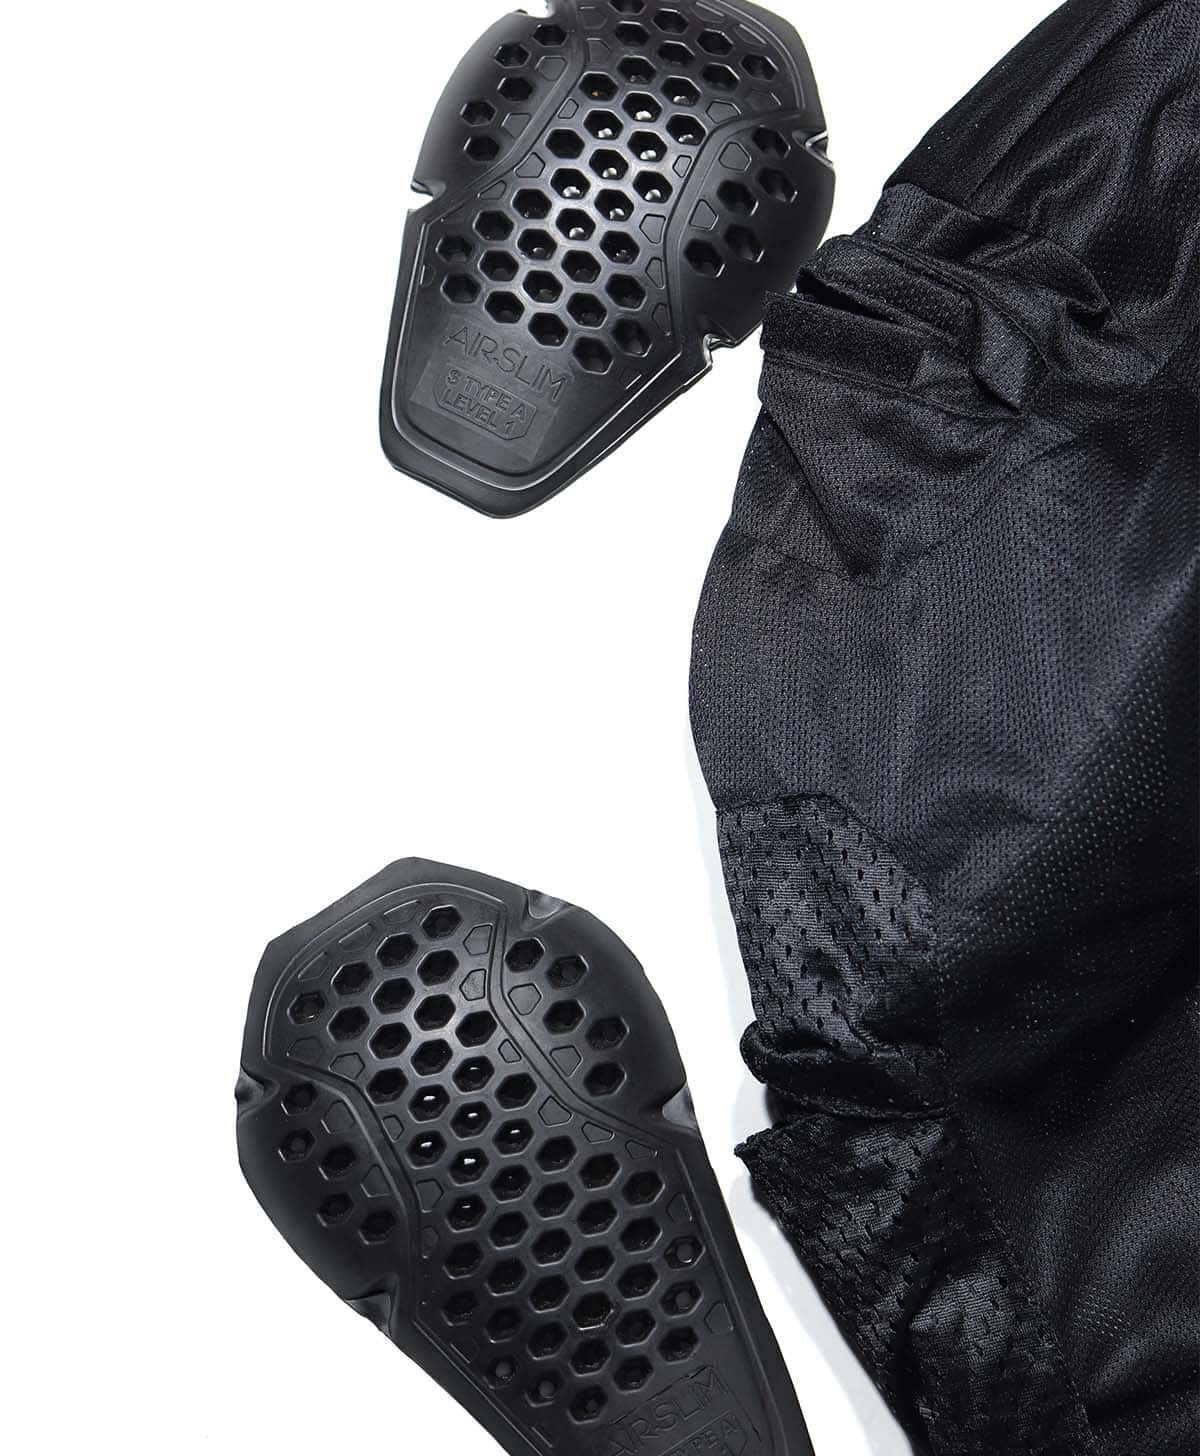 KADOYA (カドヤ) PL MONO FIGHTER パンチングモノファイター ブラック